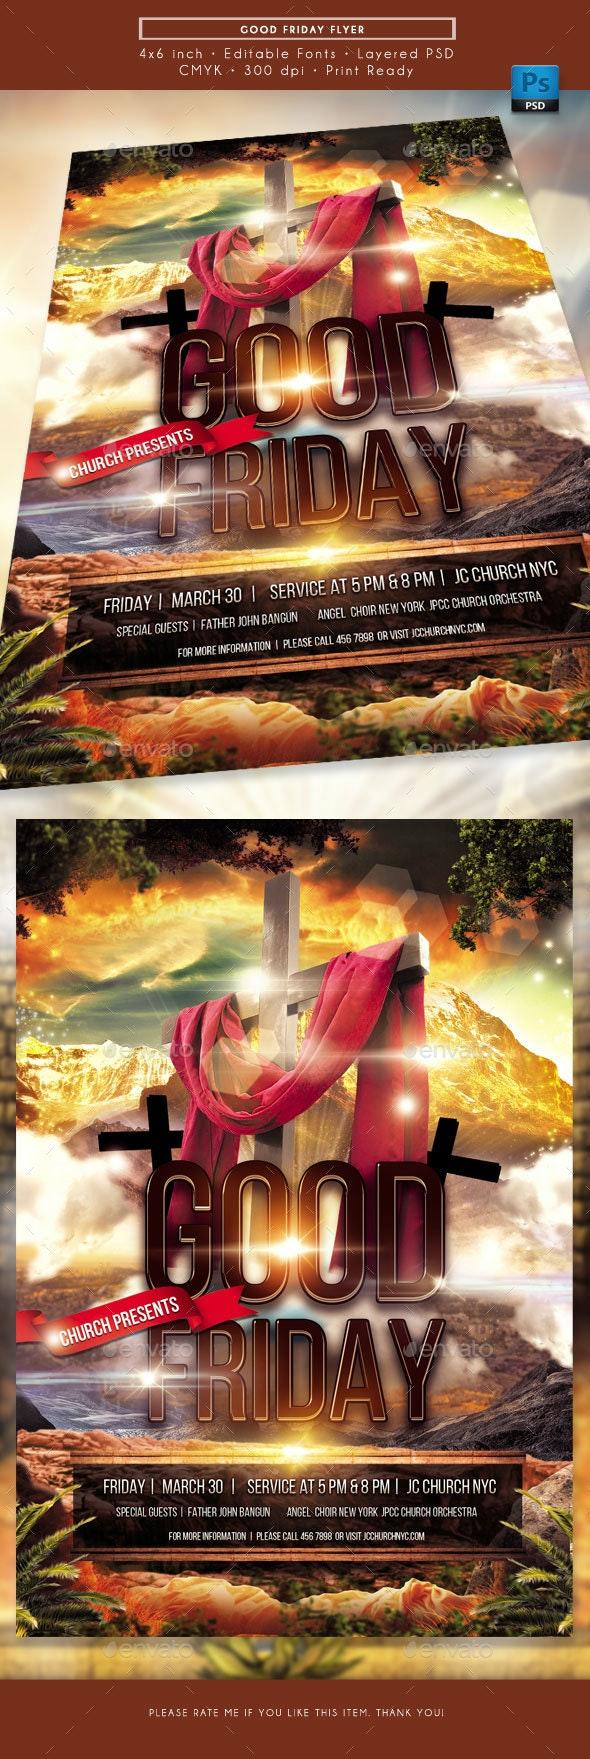 Good Friday Church Flyer - Church Flyers